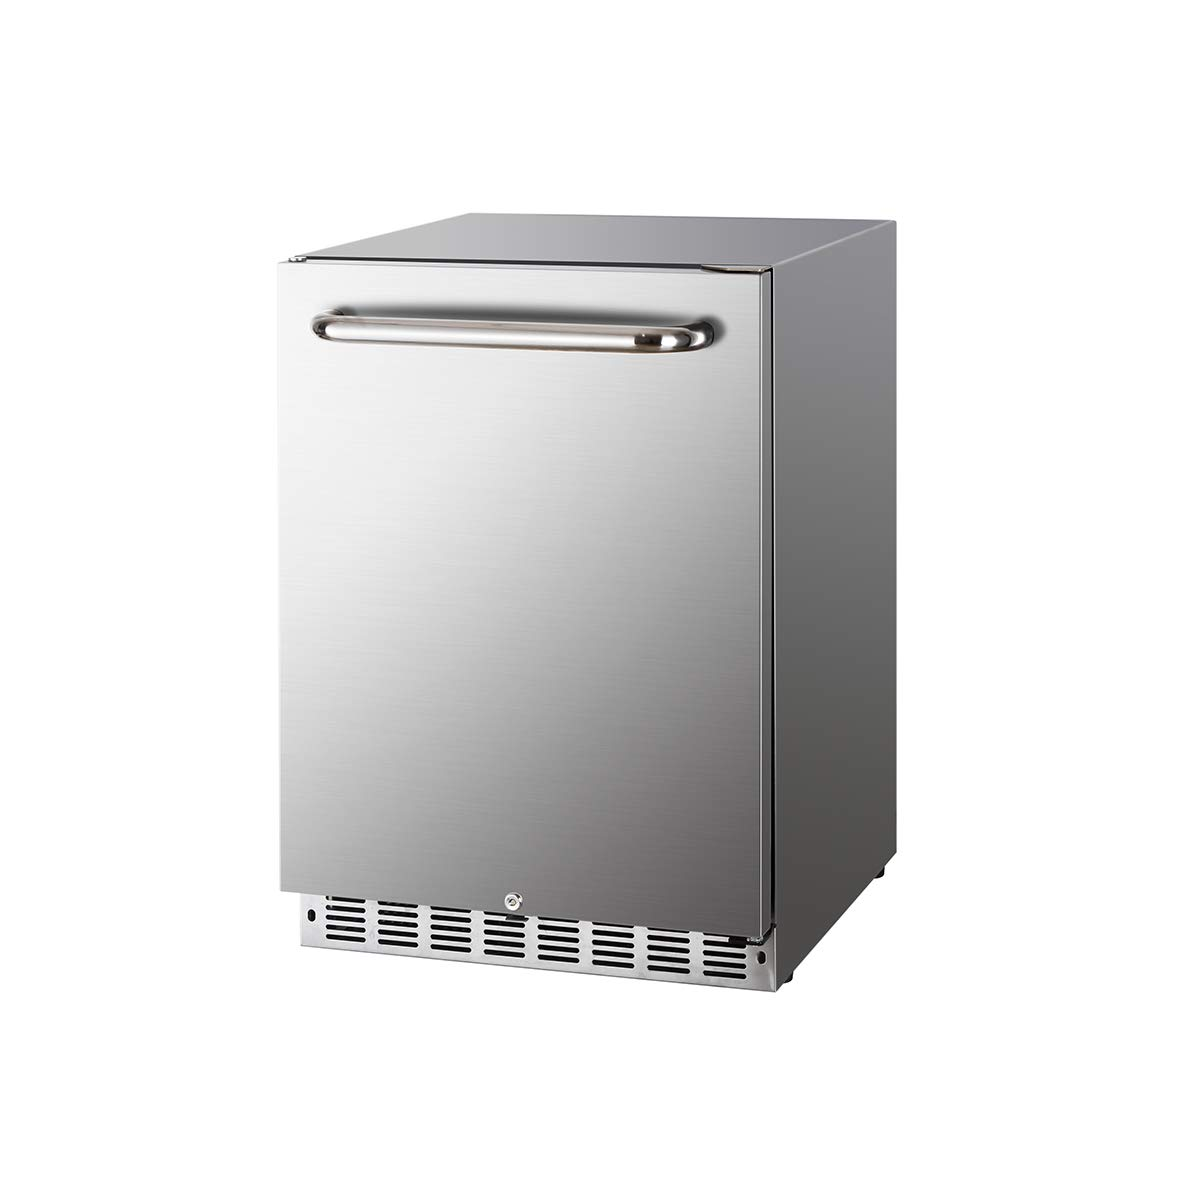 HCK Refrigerator Beverage Reversible Stainless